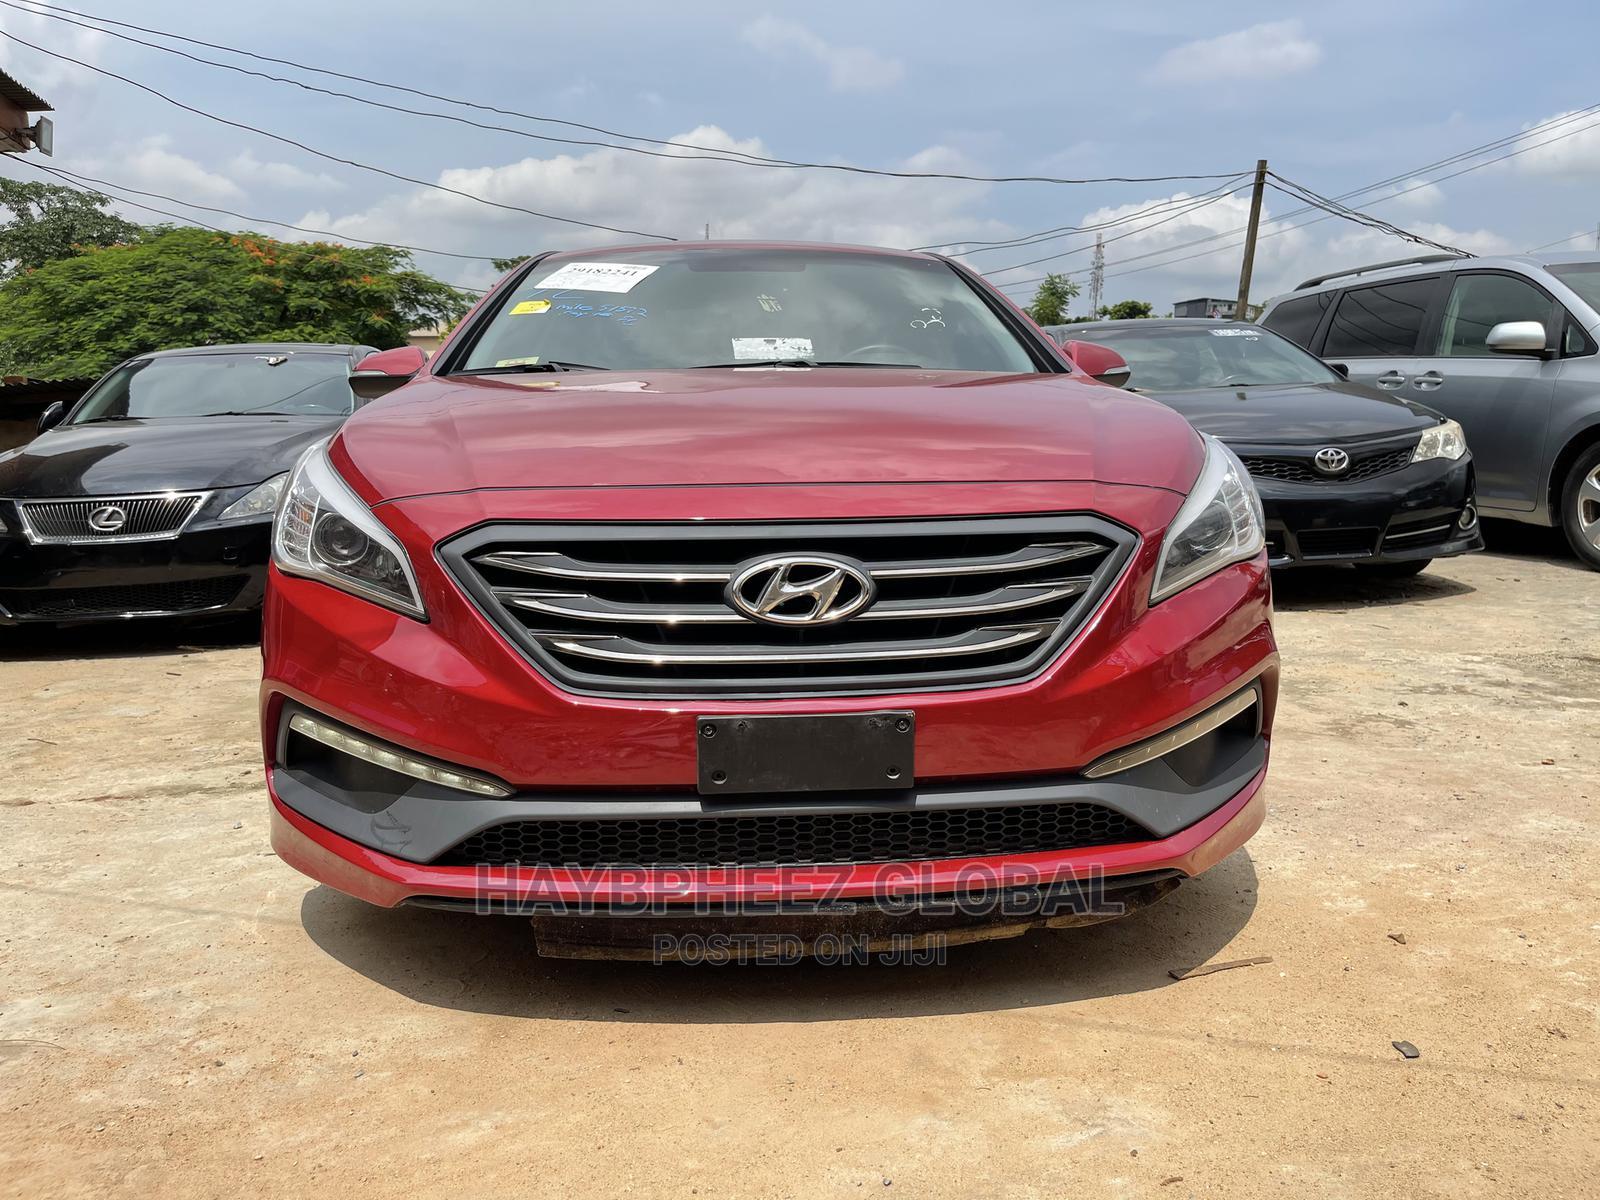 Hyundai Sonata 2016 Red